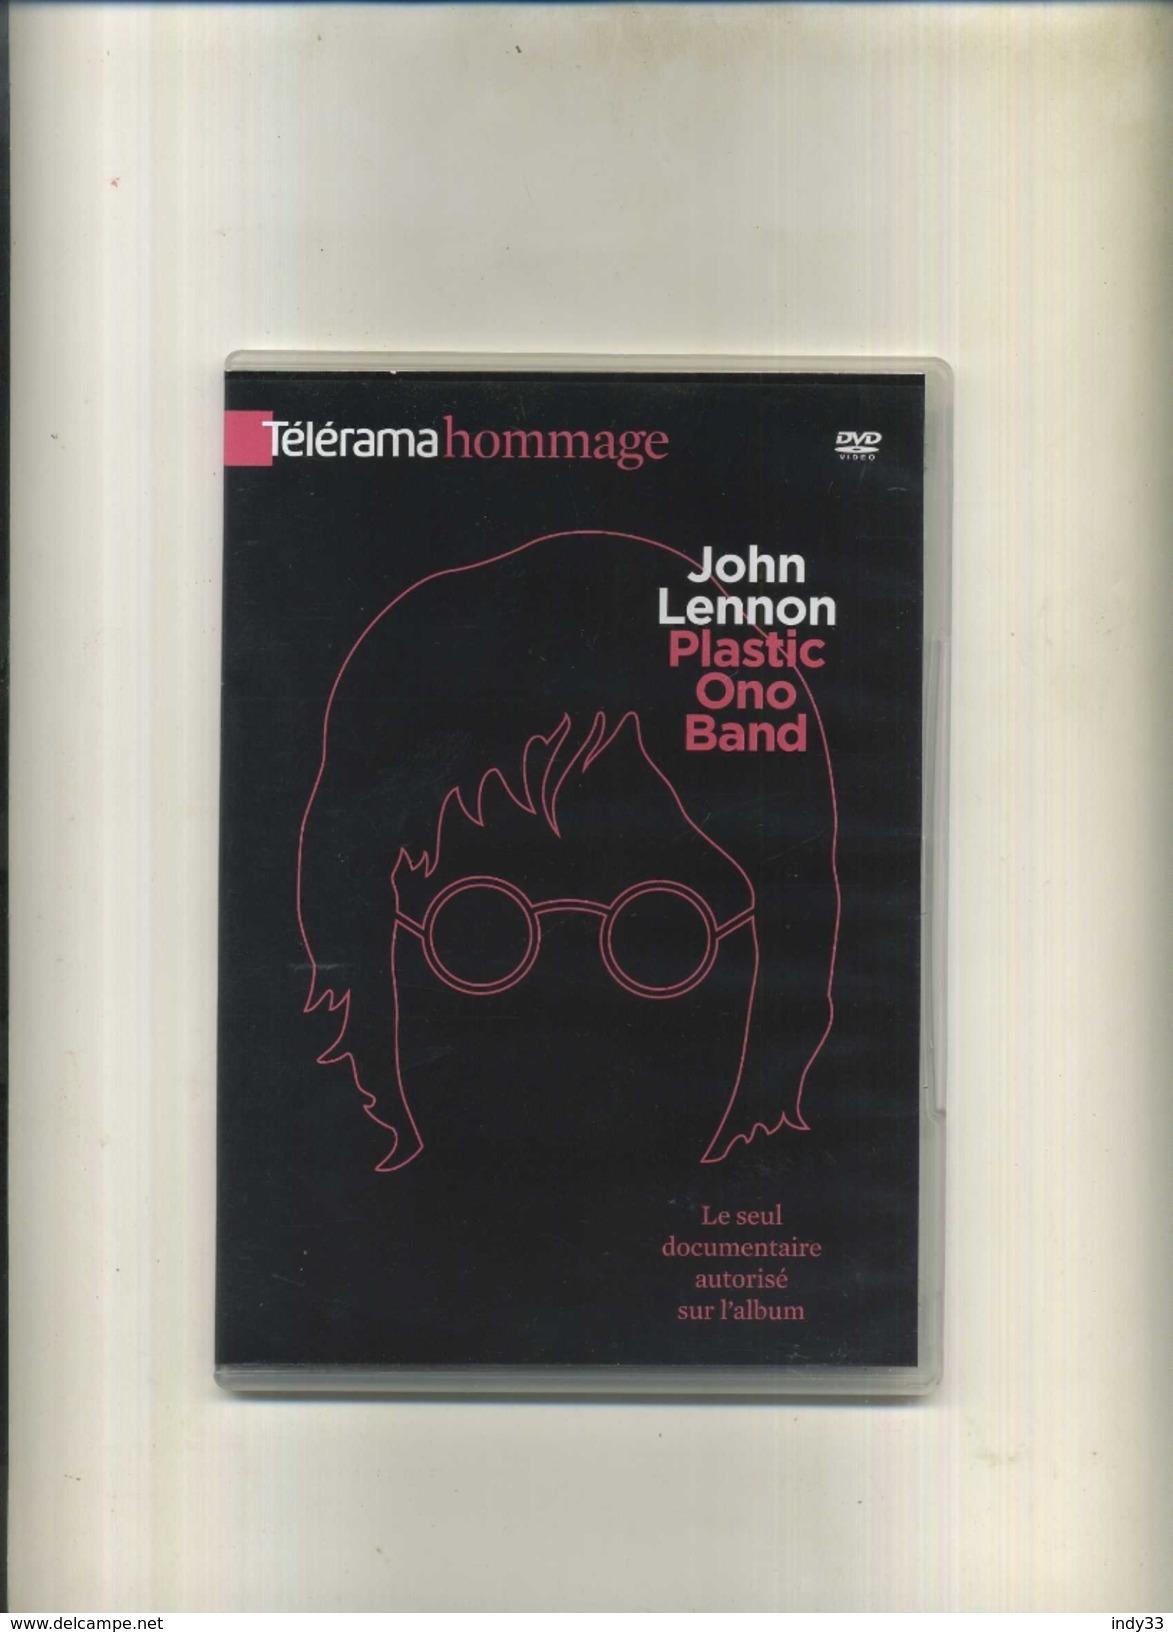 JOHN LENNON PLASTIC ONO BAND . TELERAMA HOMMAGE . DVD . - Musik-DVD's